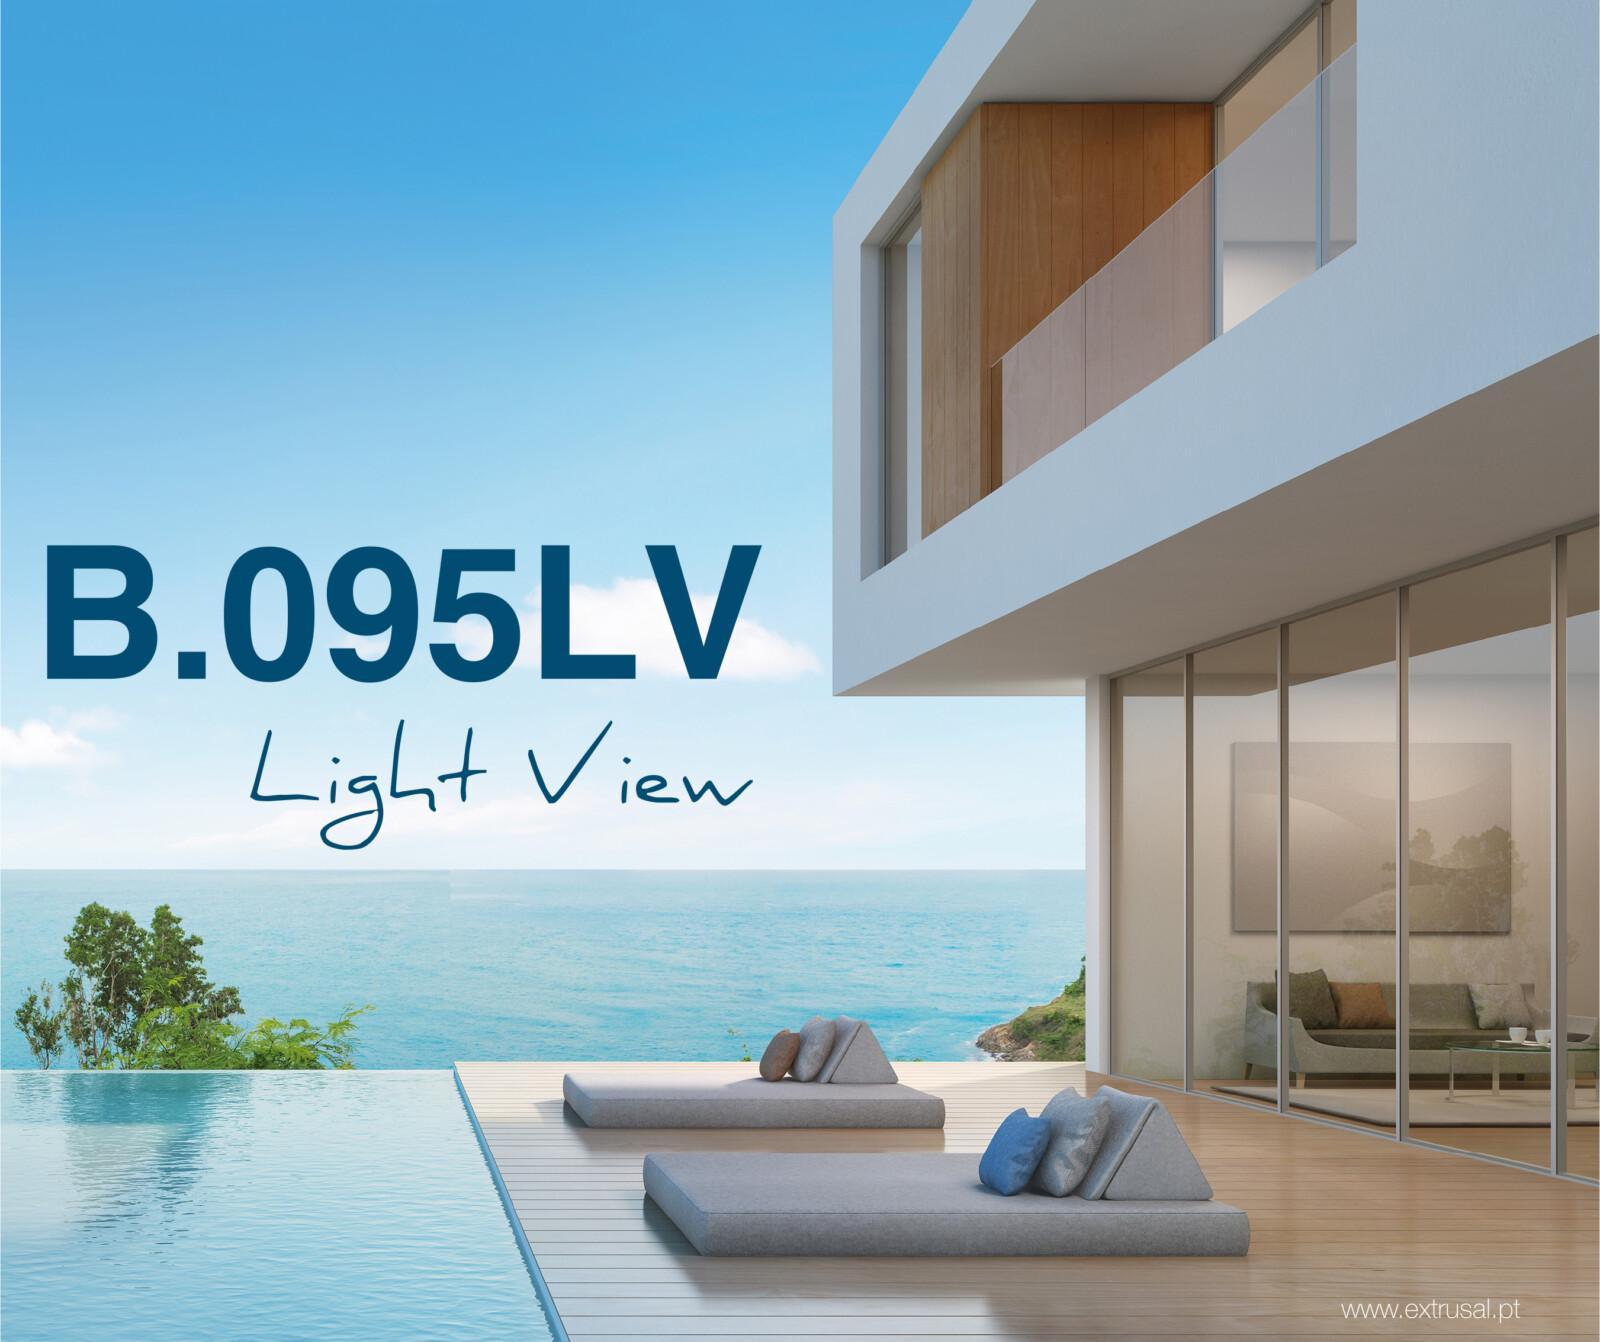 Extrusal apresenta sistema de janelas B.095 Light View